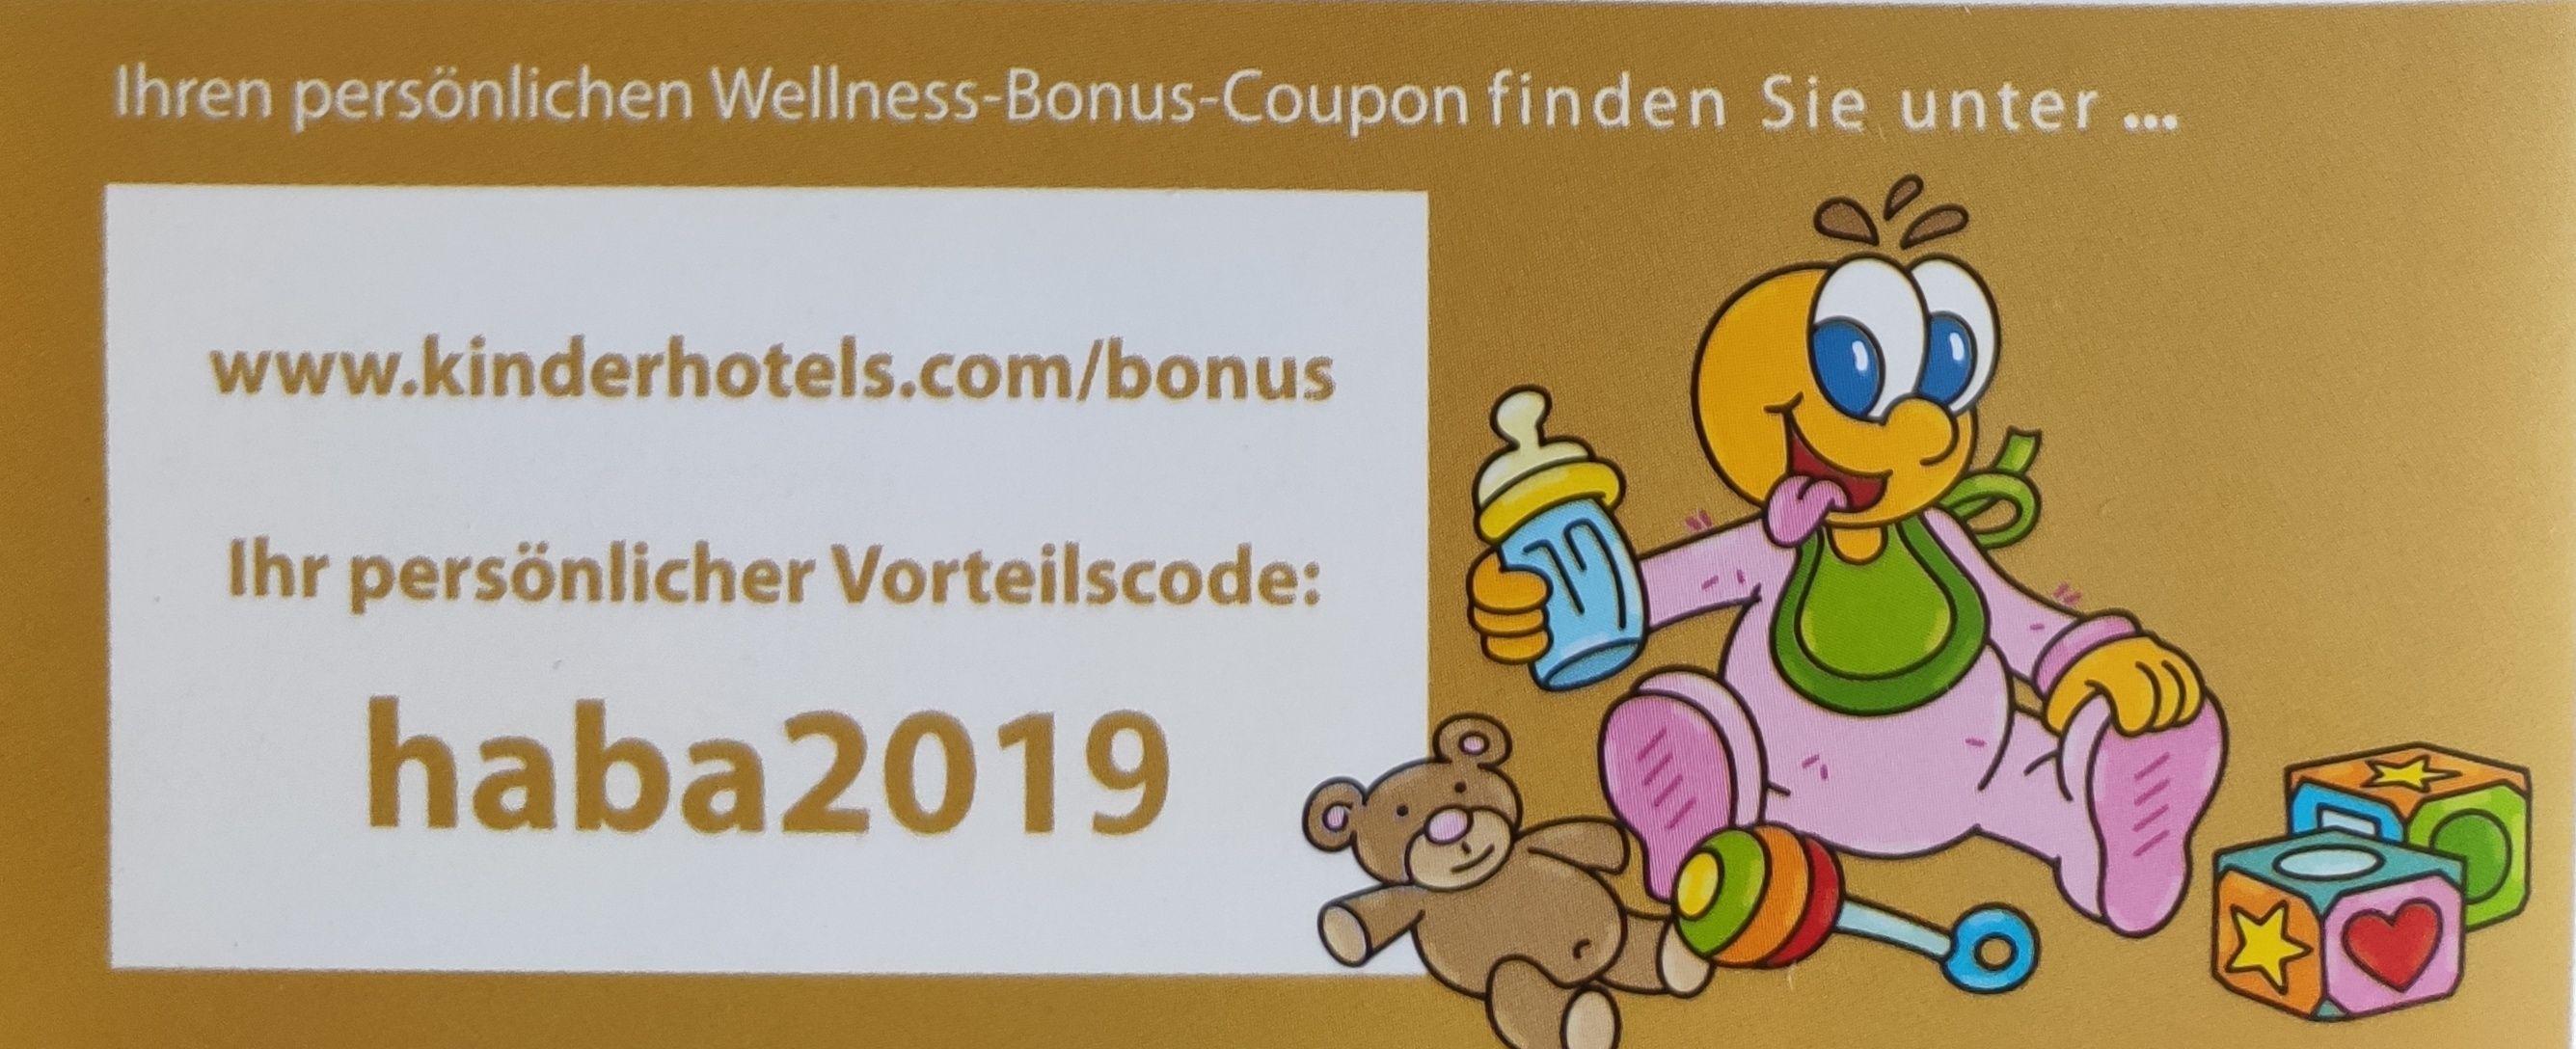 40€ Wellness-Bonus-Coupon für Kinderhotels